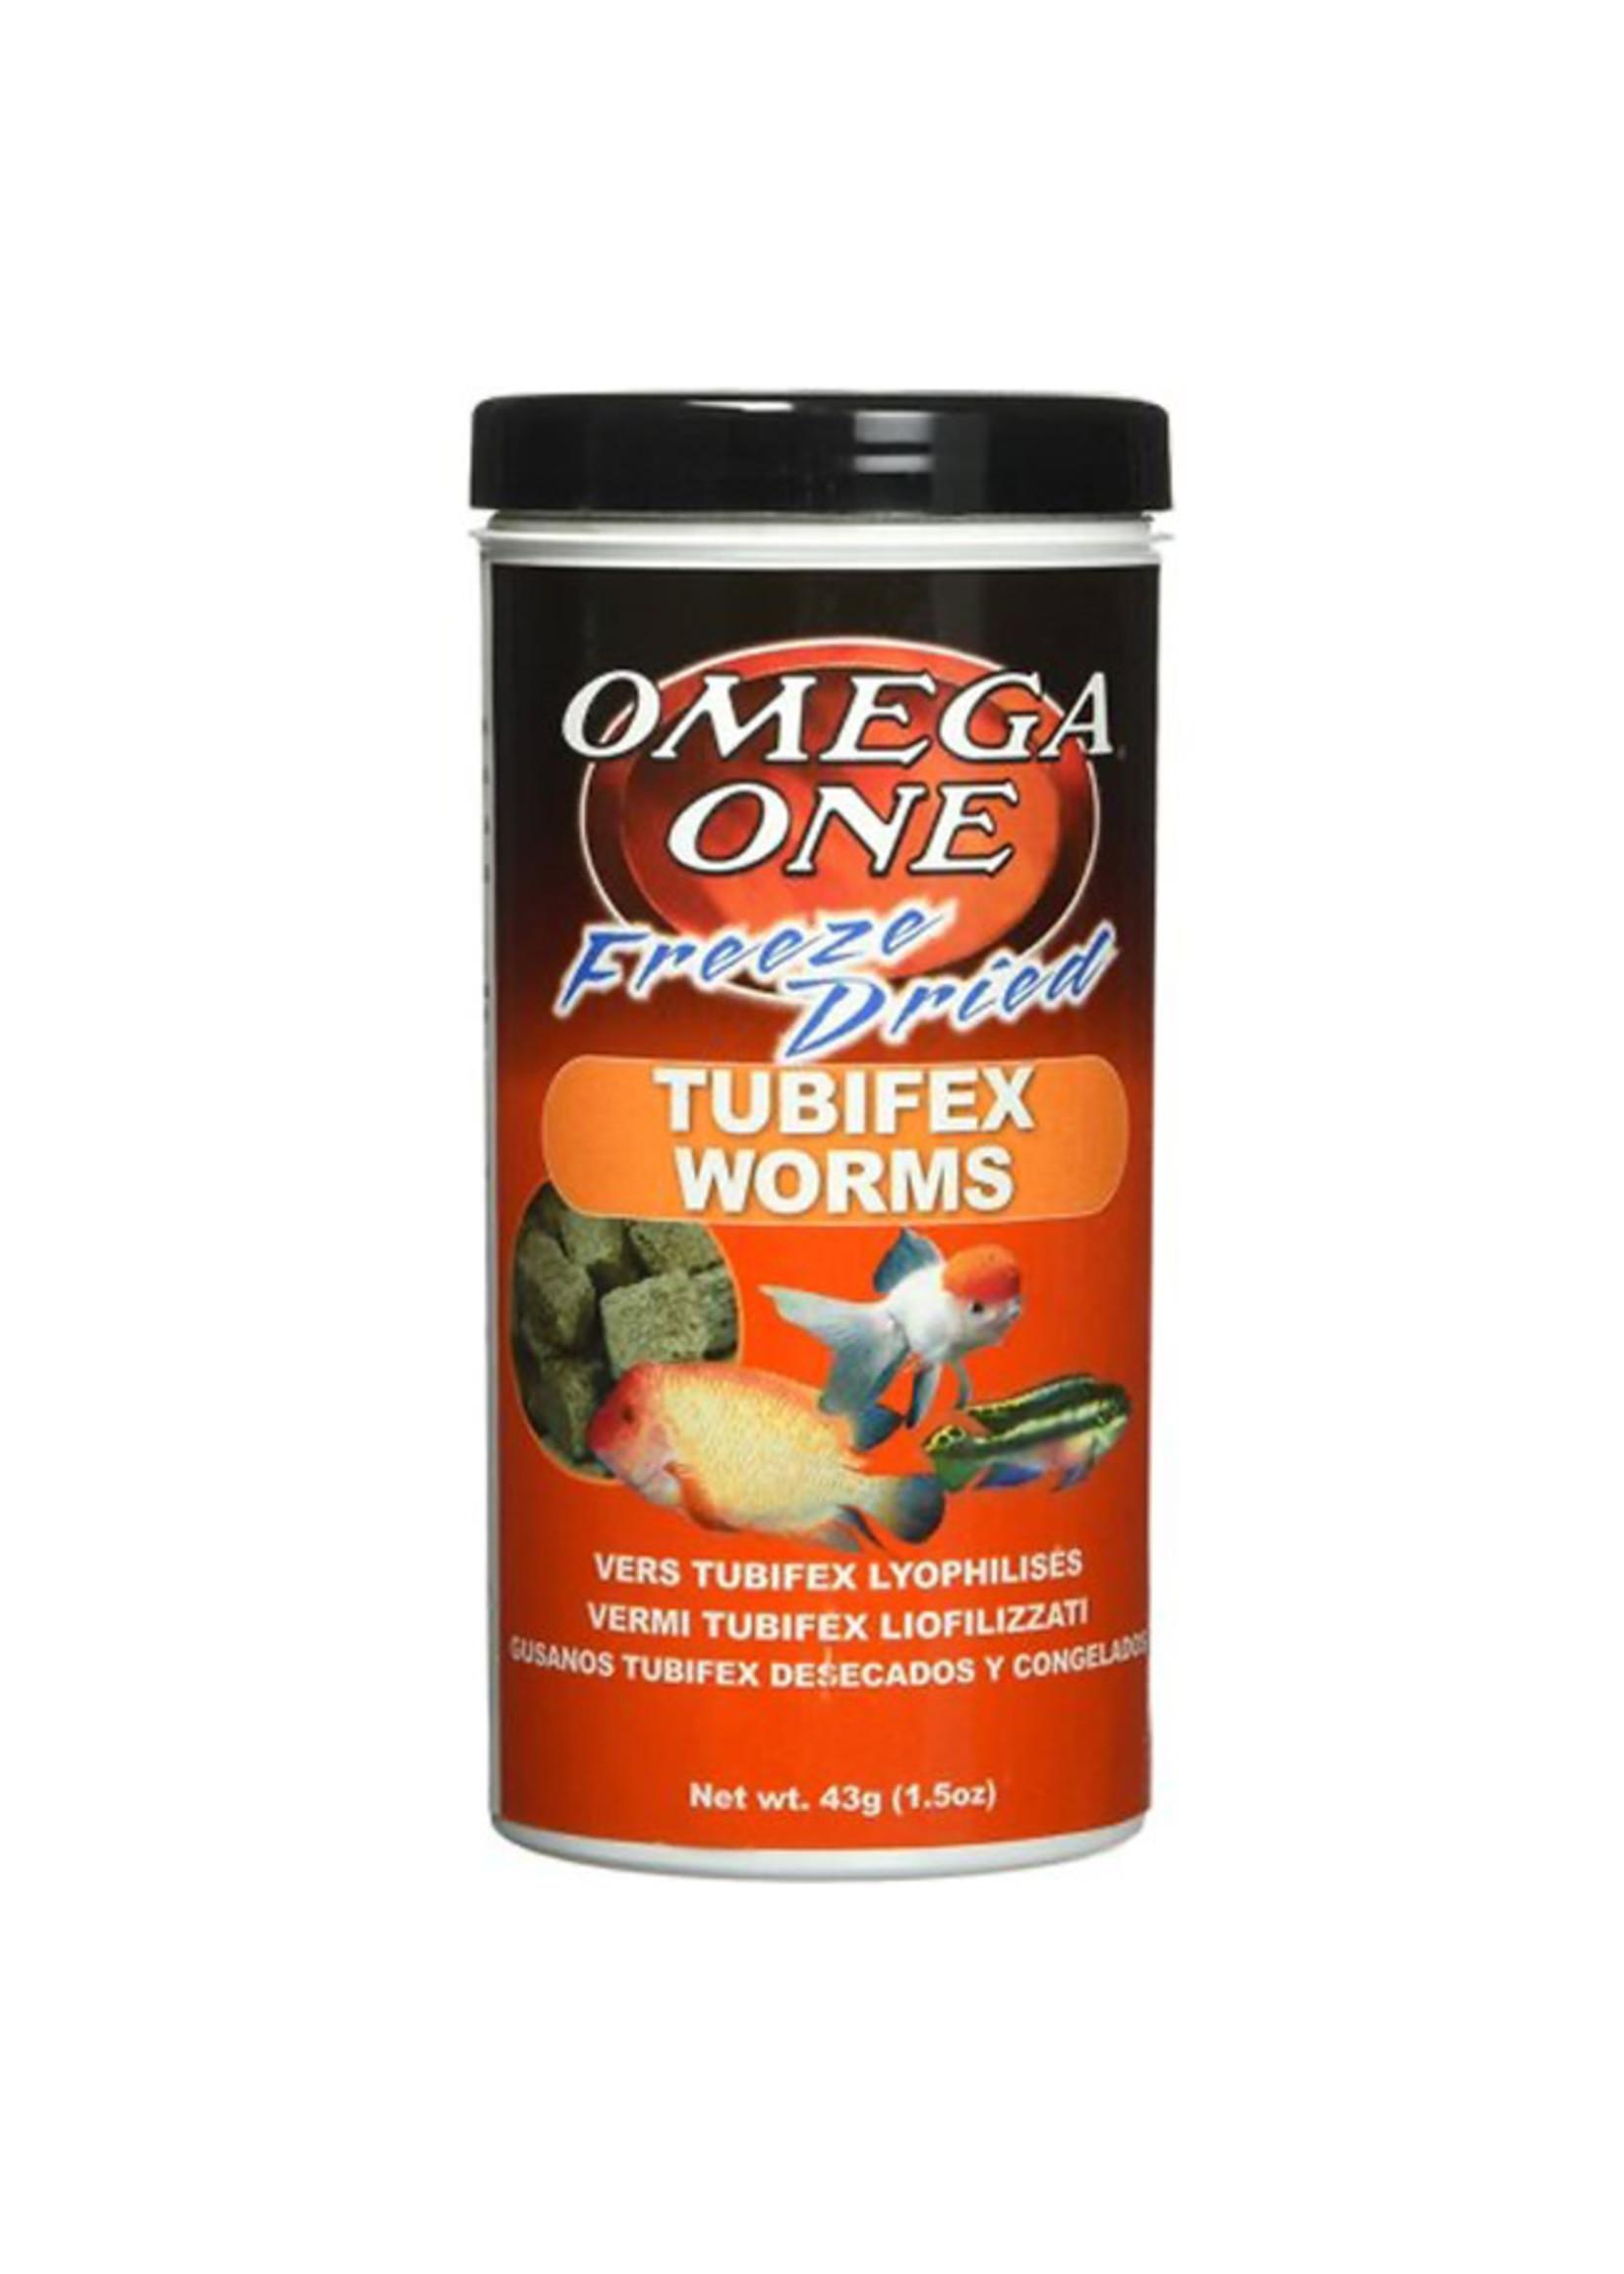 Omega One Omega One Freeze Dried Tubifex Worms Nutri-Treat